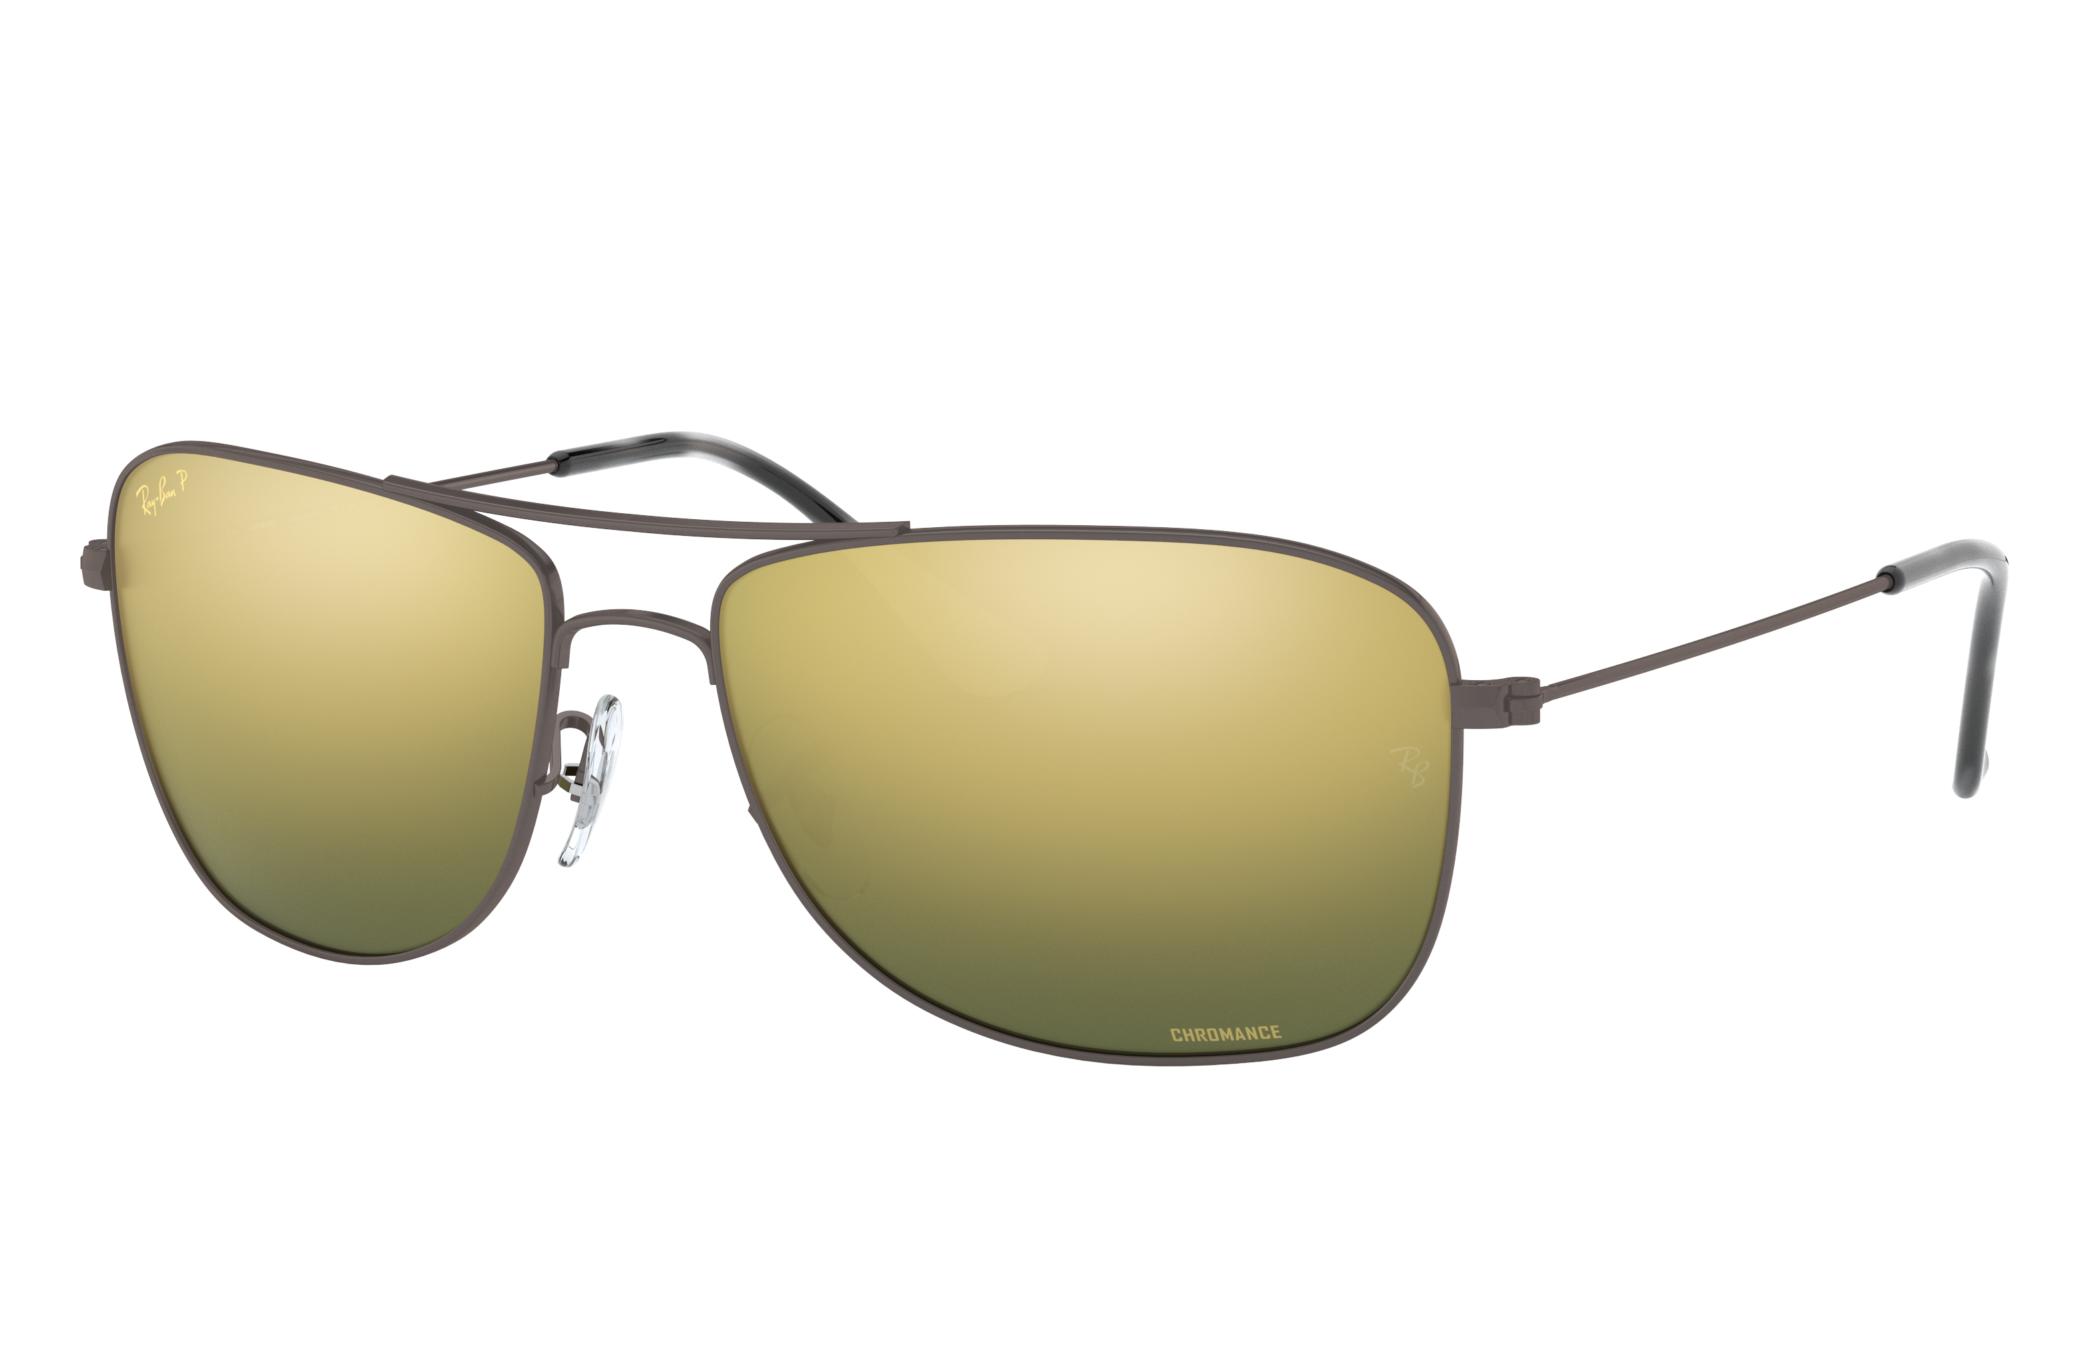 Ray-Ban Rb3543 Chromance Gunmetal, Polarized Green Lenses - RB3543